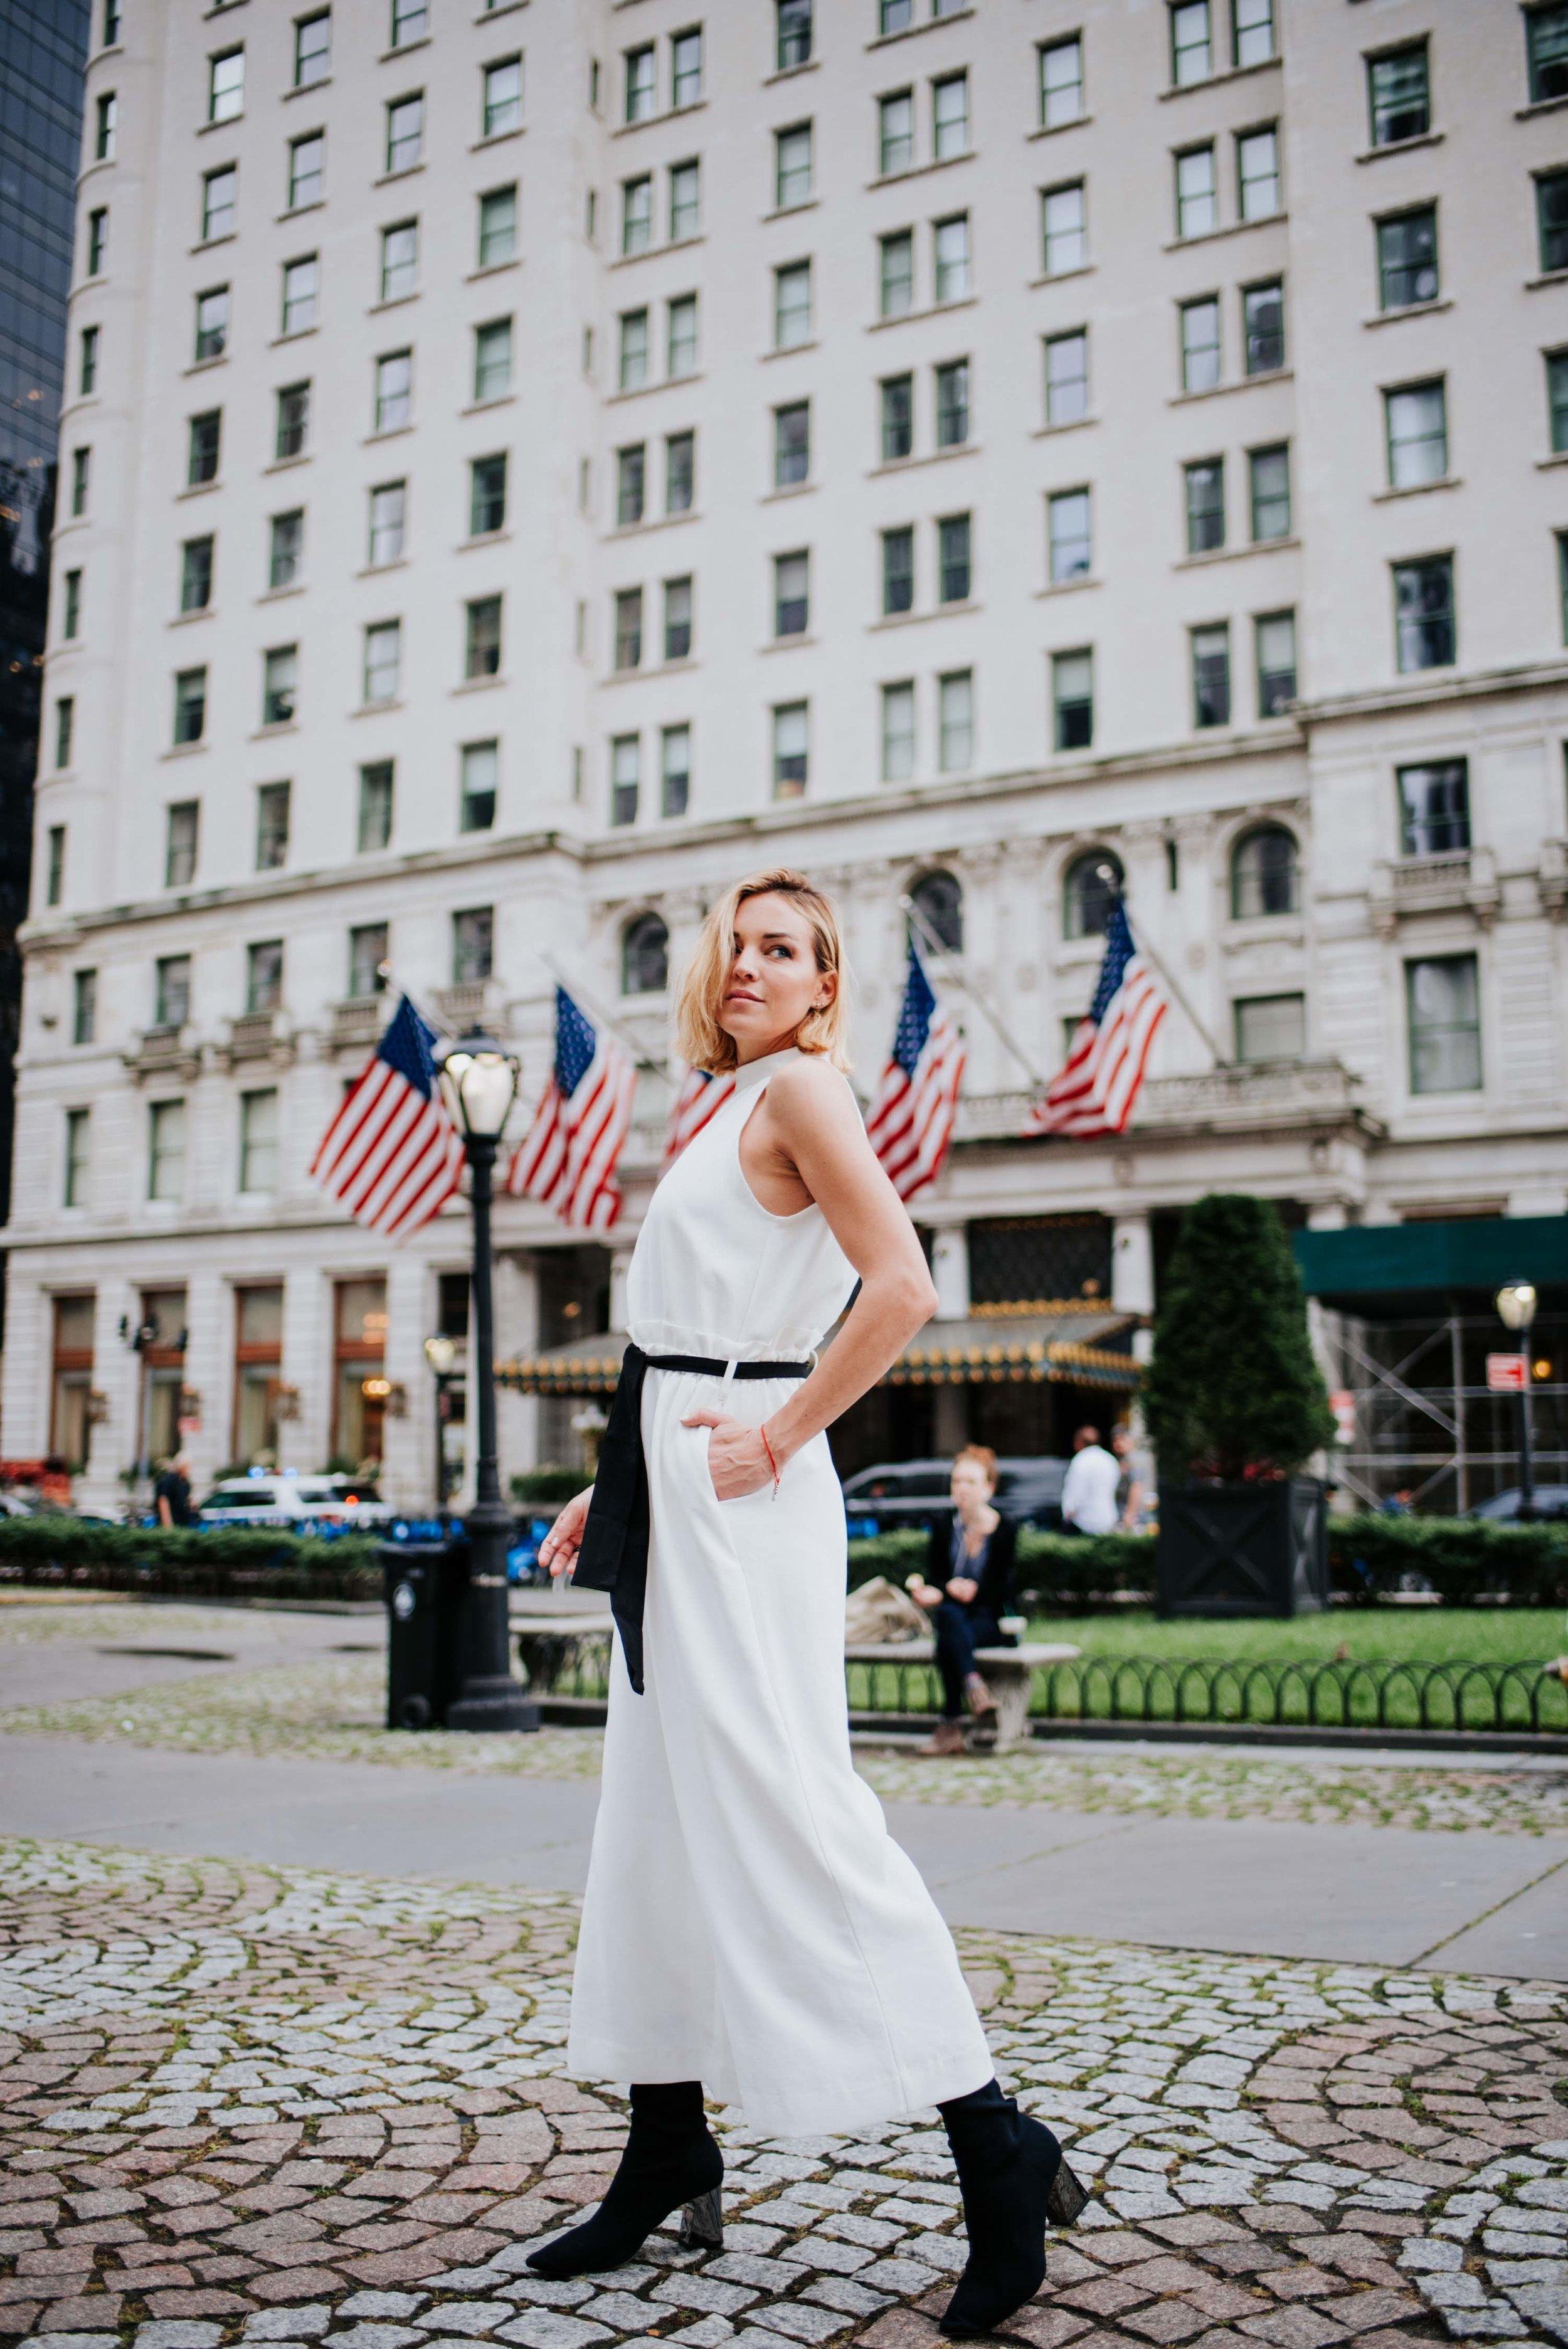 Flor Scharemberg en NYC por Malvina Battiston 028.jpg